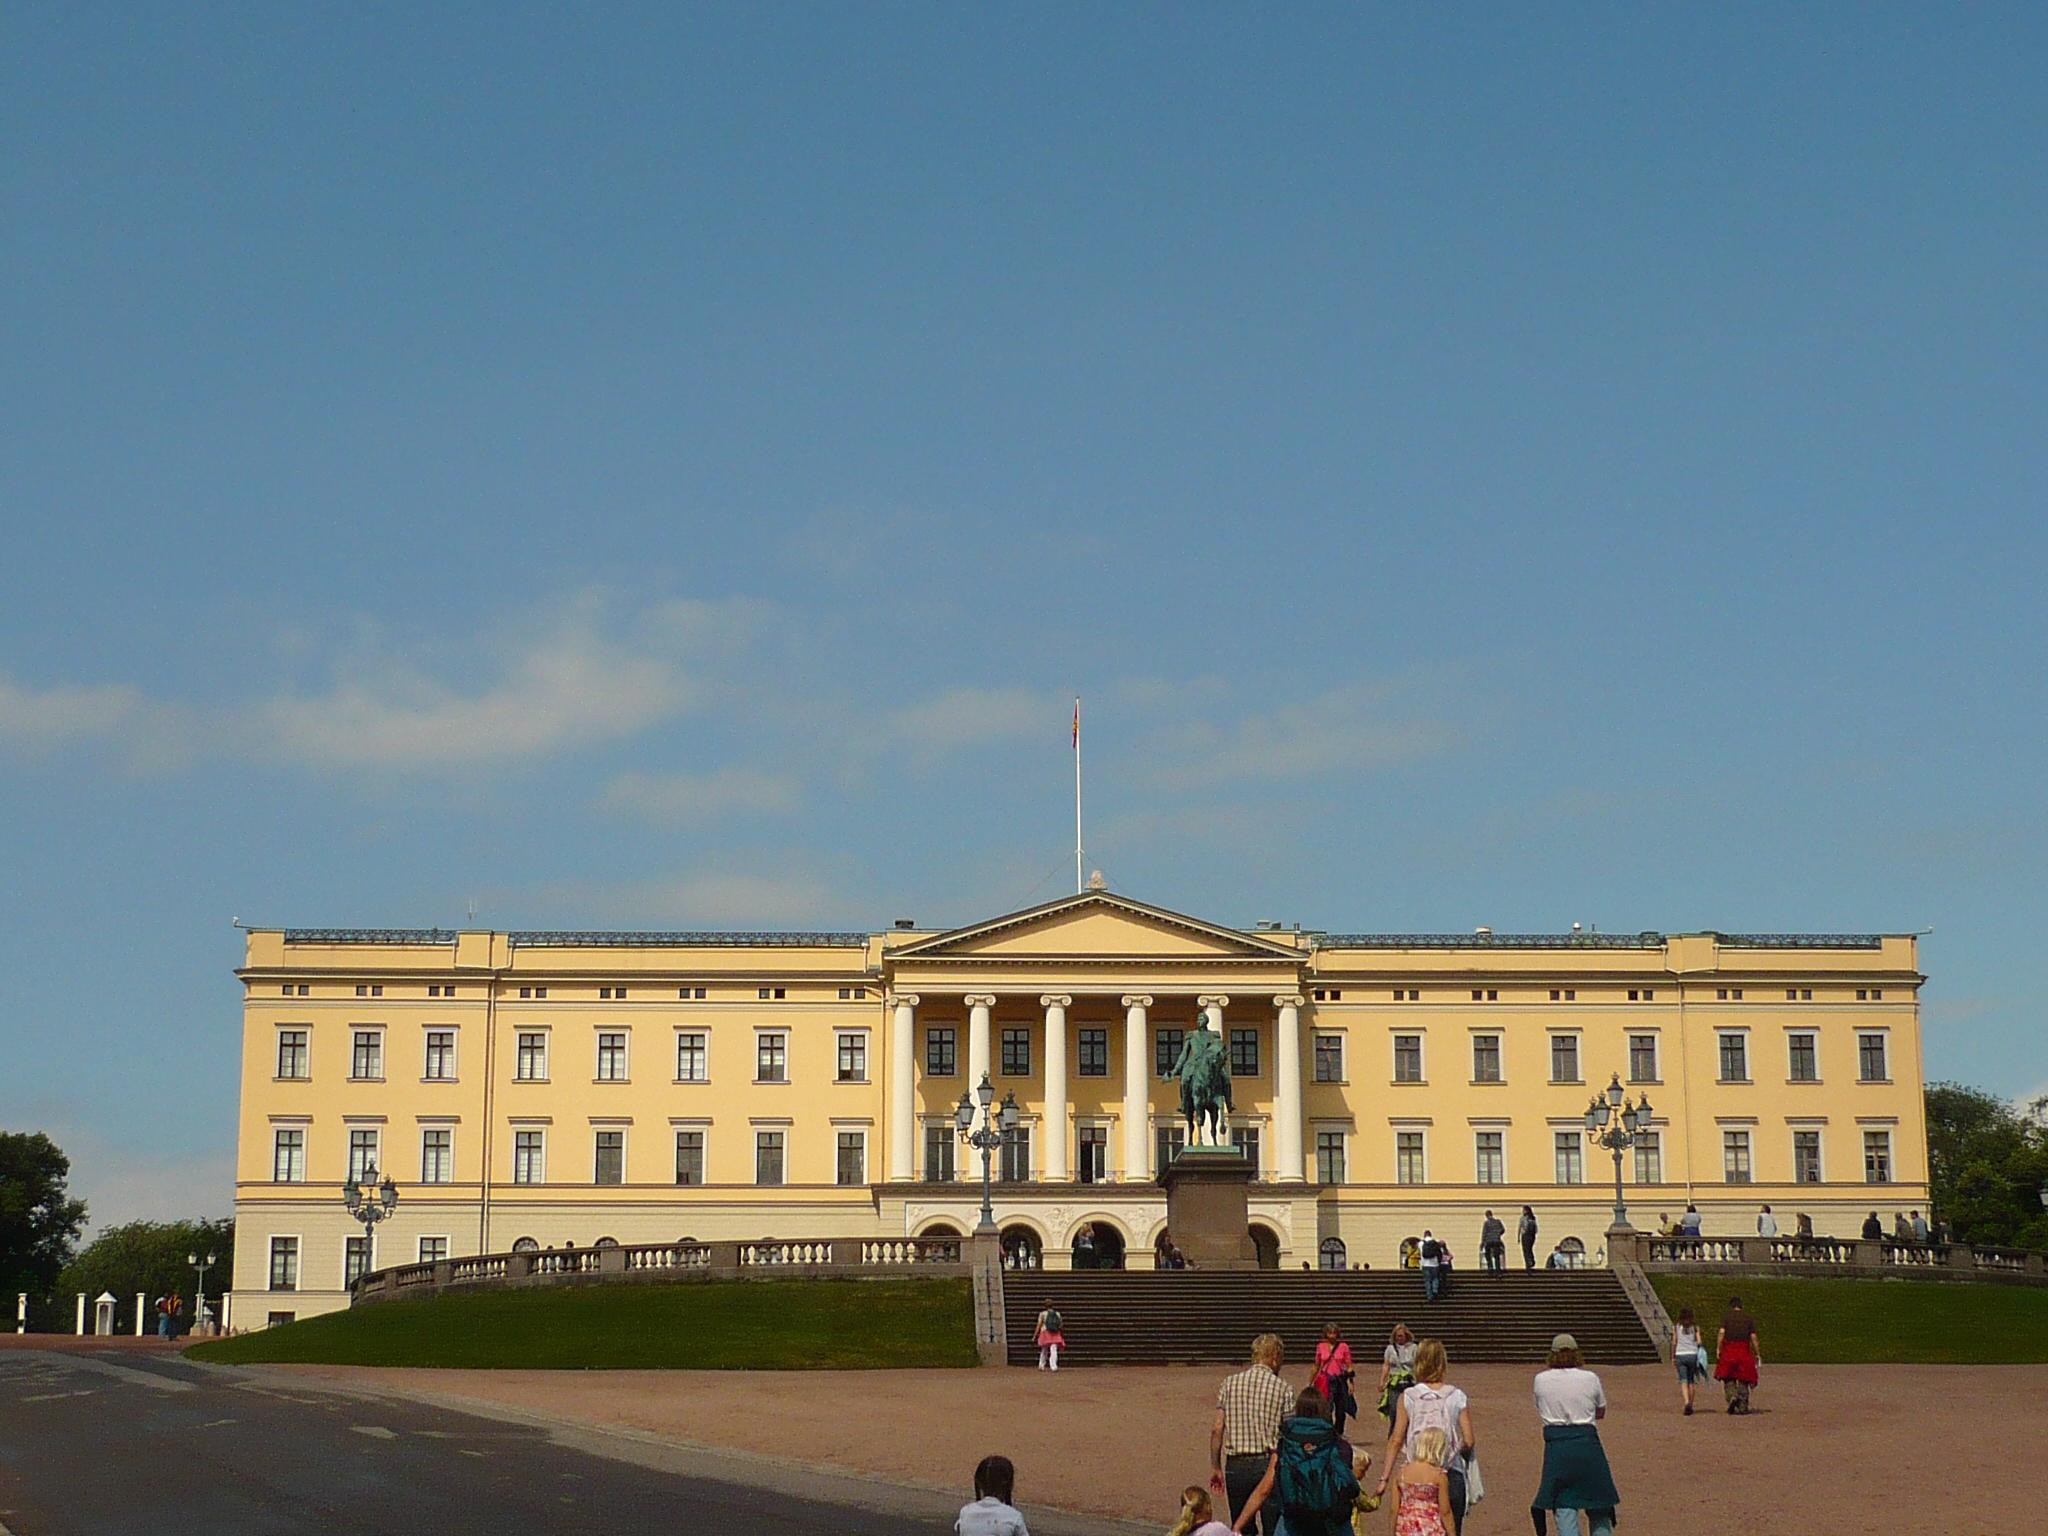 Oslo - Royal Palace